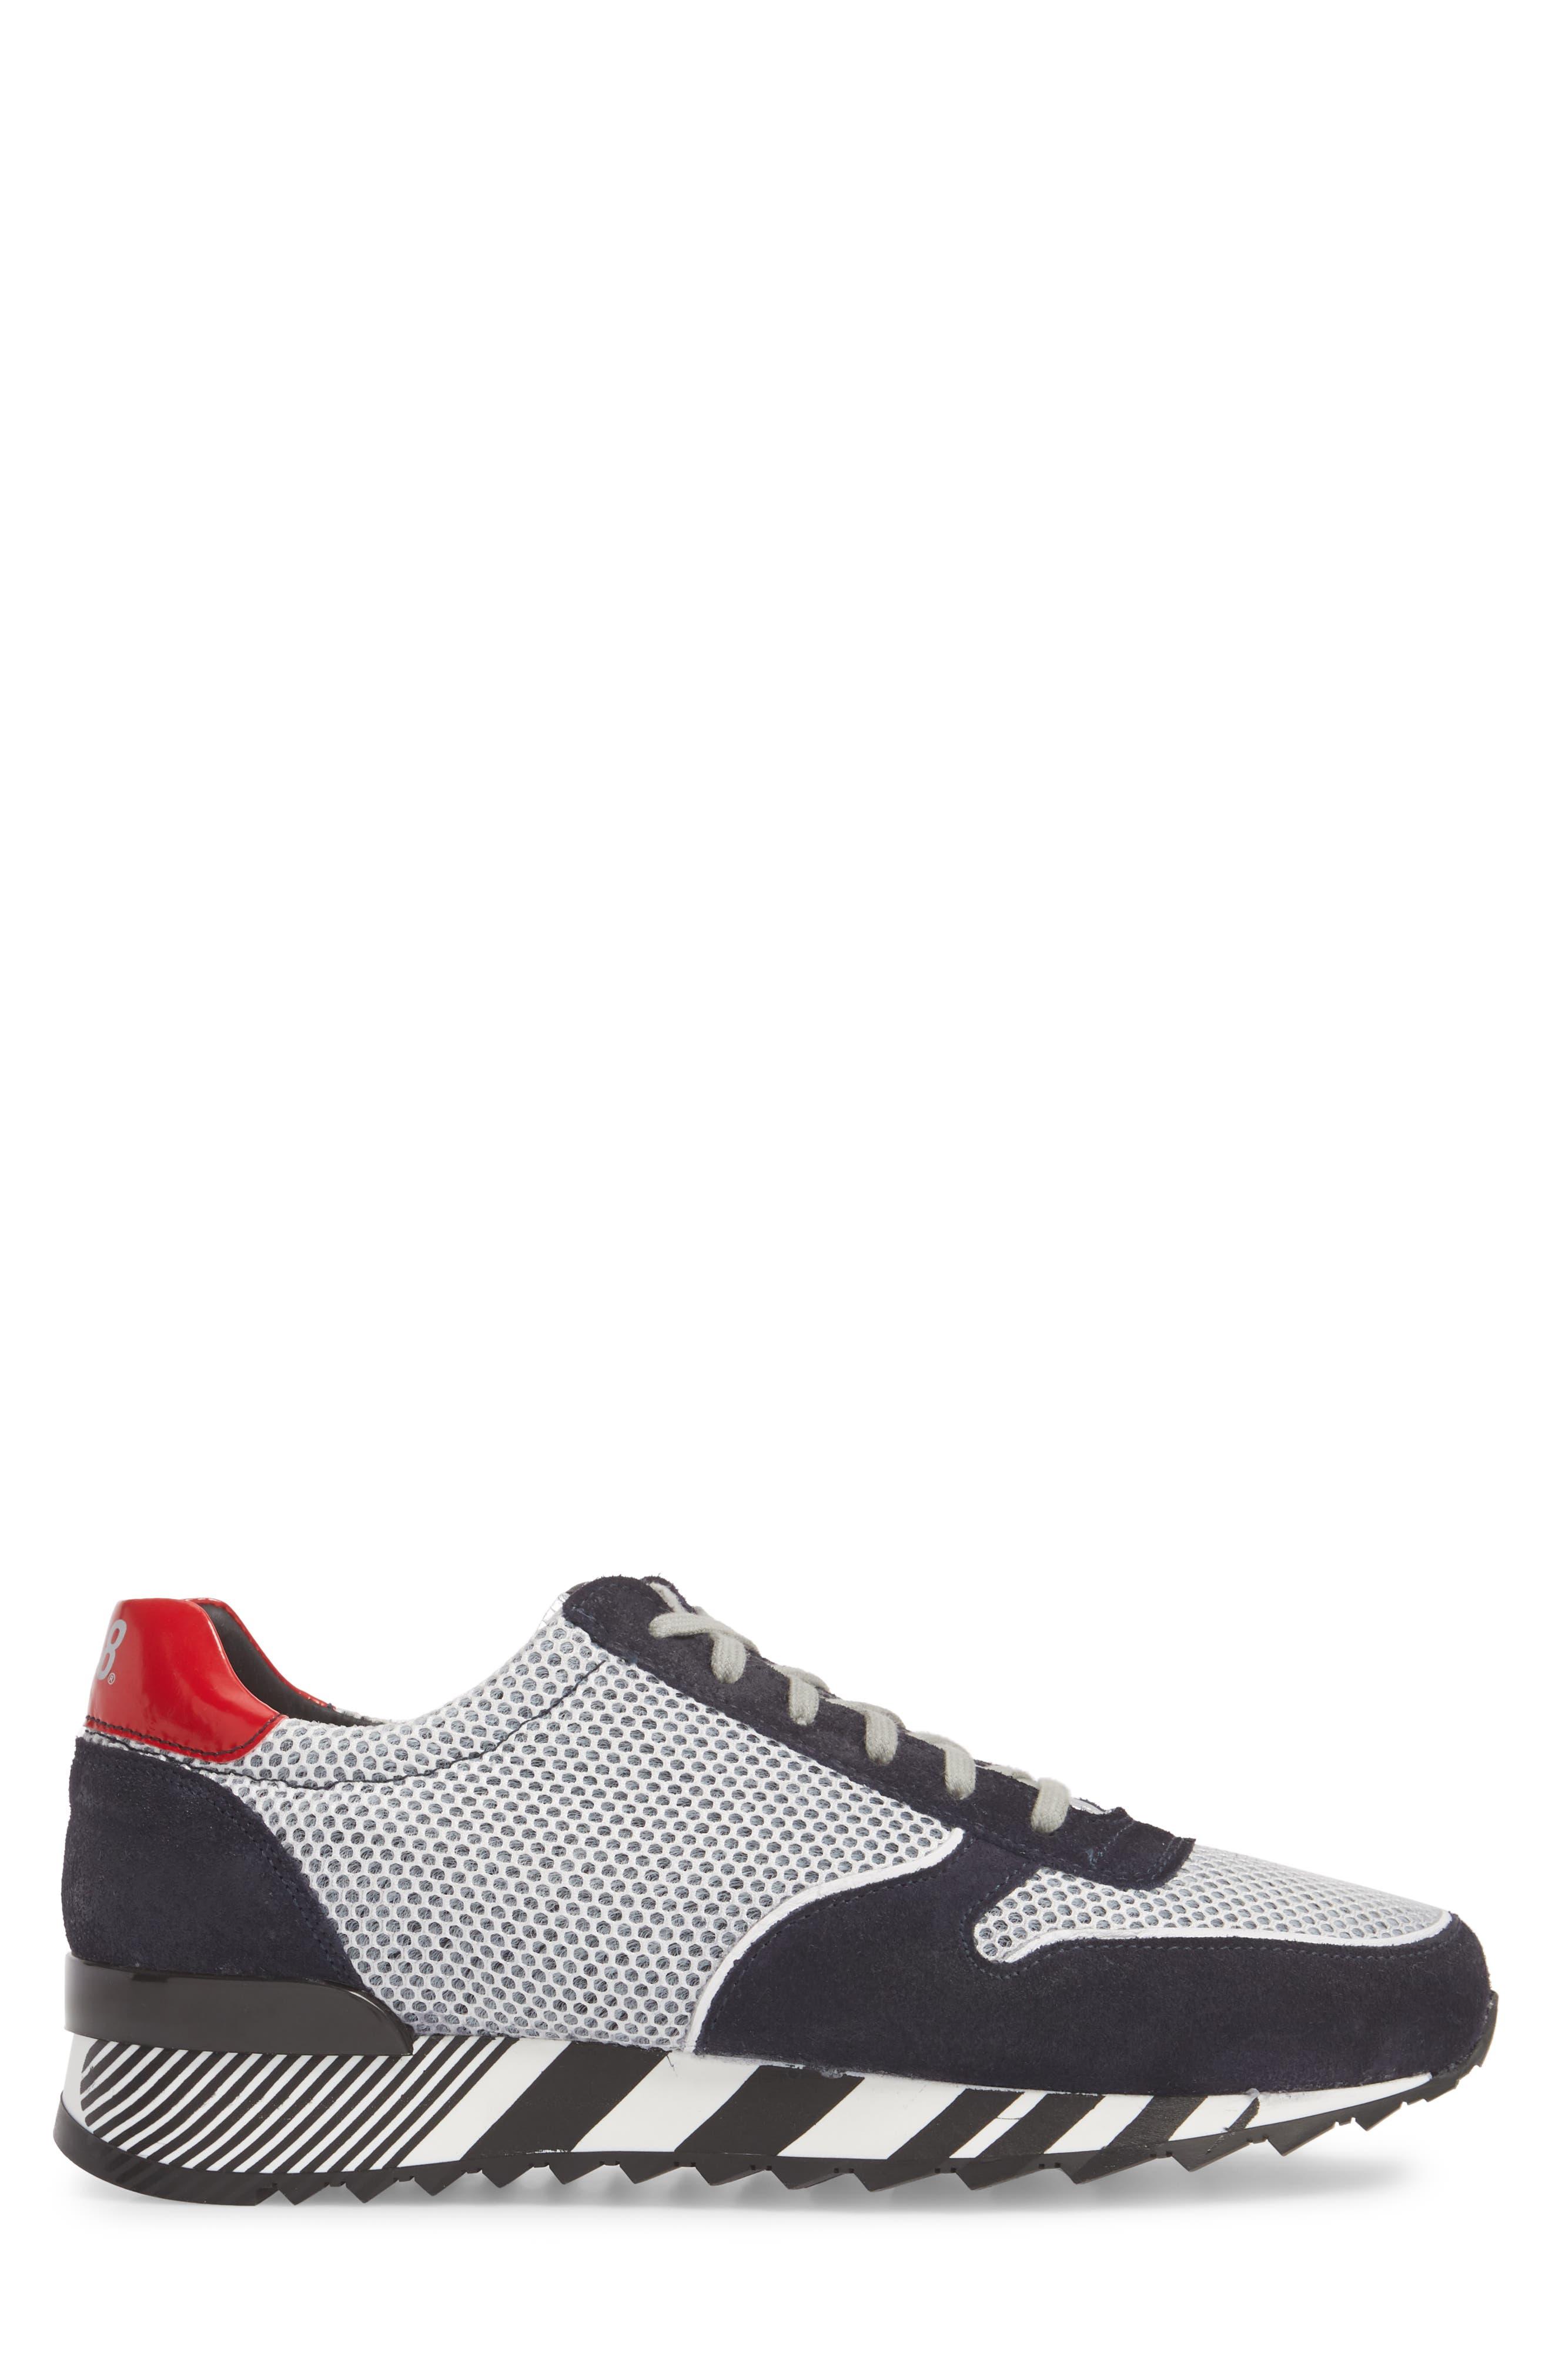 Boston Low Top Sneaker,                             Alternate thumbnail 3, color,                             Sand Grey